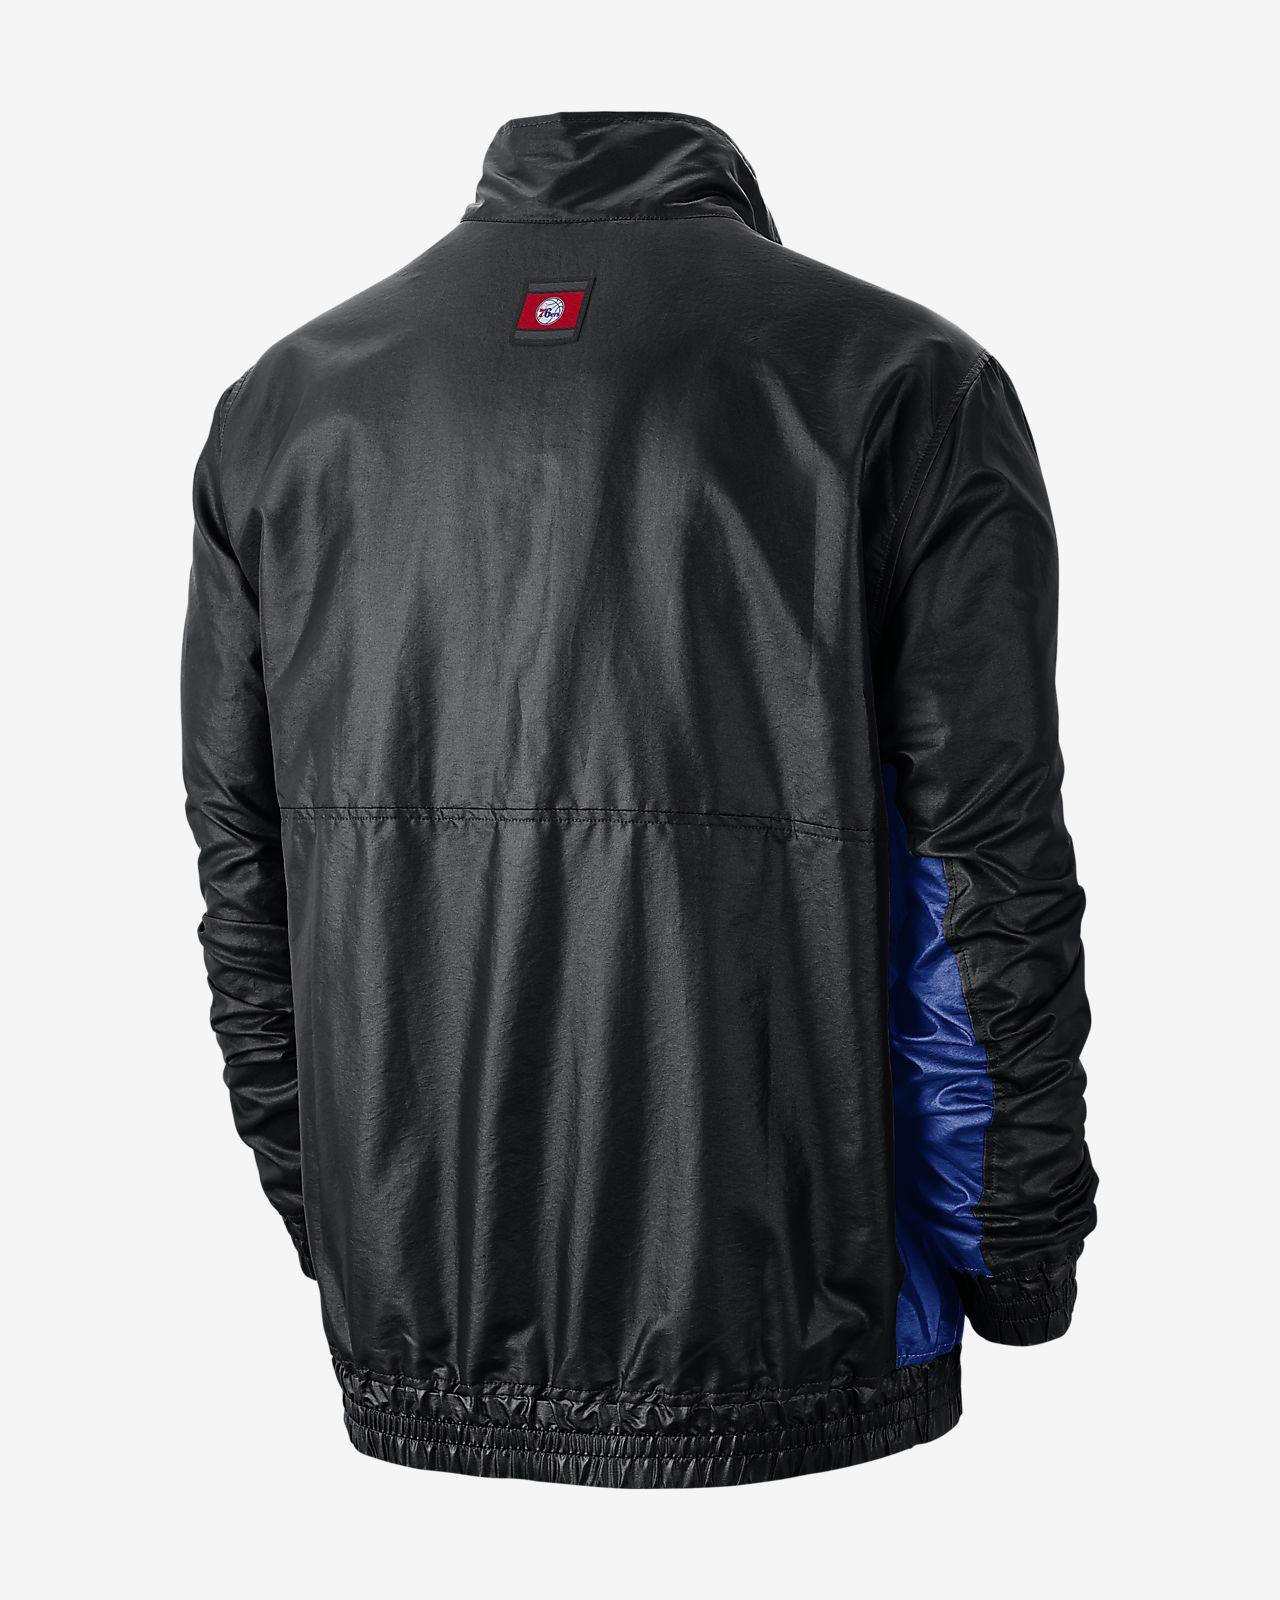 diseño innovador 0a839 e888c Philadelphia 76ers Nike Chaqueta de la NBA ligera - Hombre